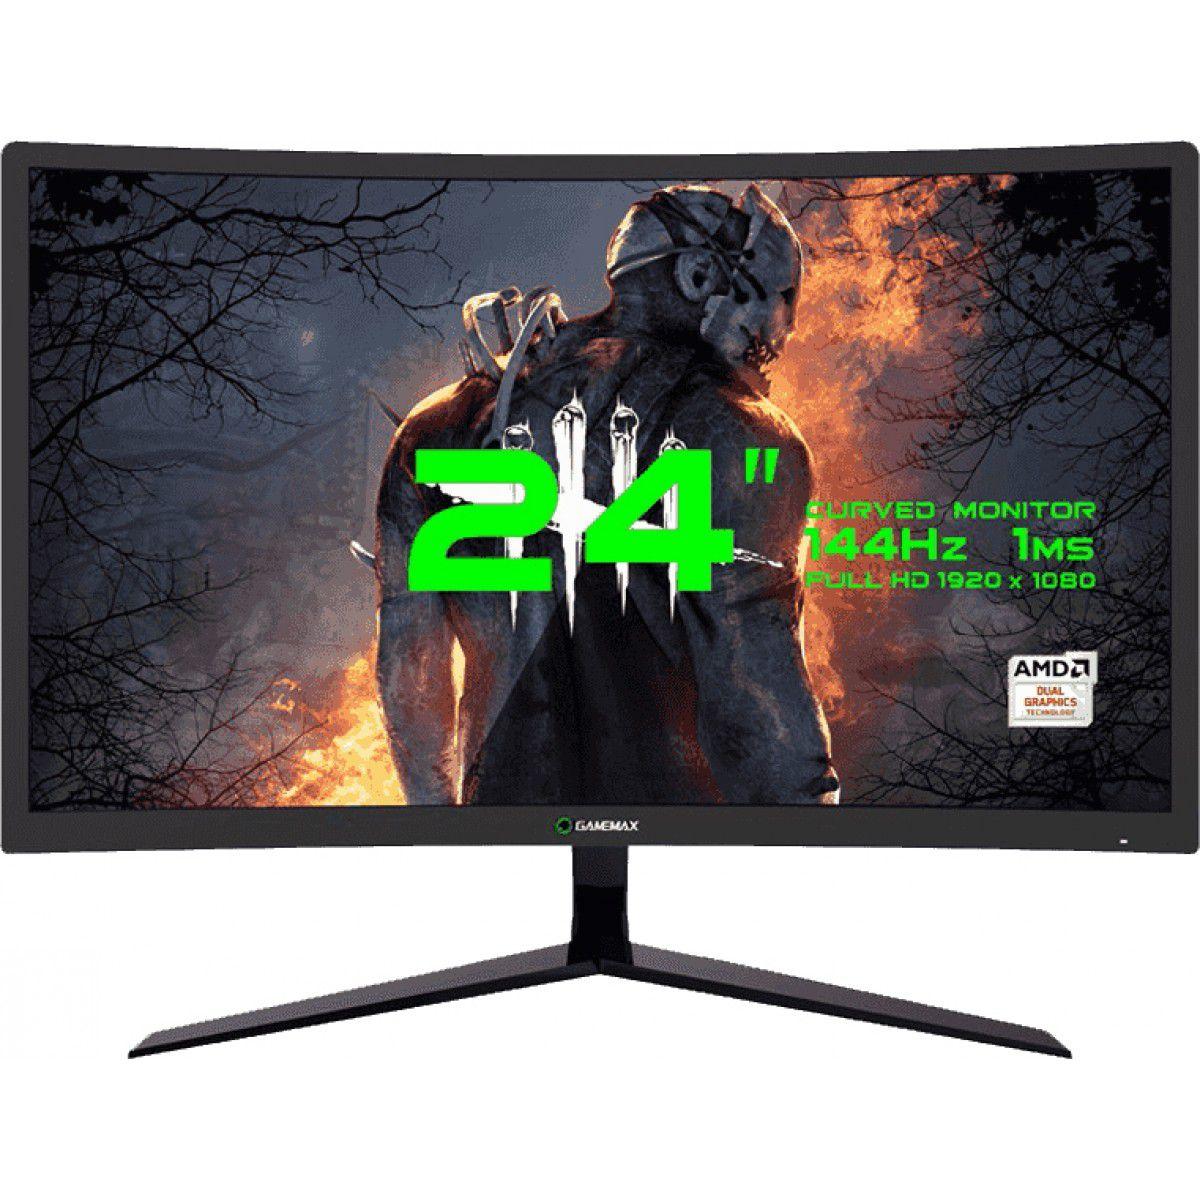 Monitor Gamer GameMax 24 Curvo, FHD, 144Hz, 1ms, GMX24C144